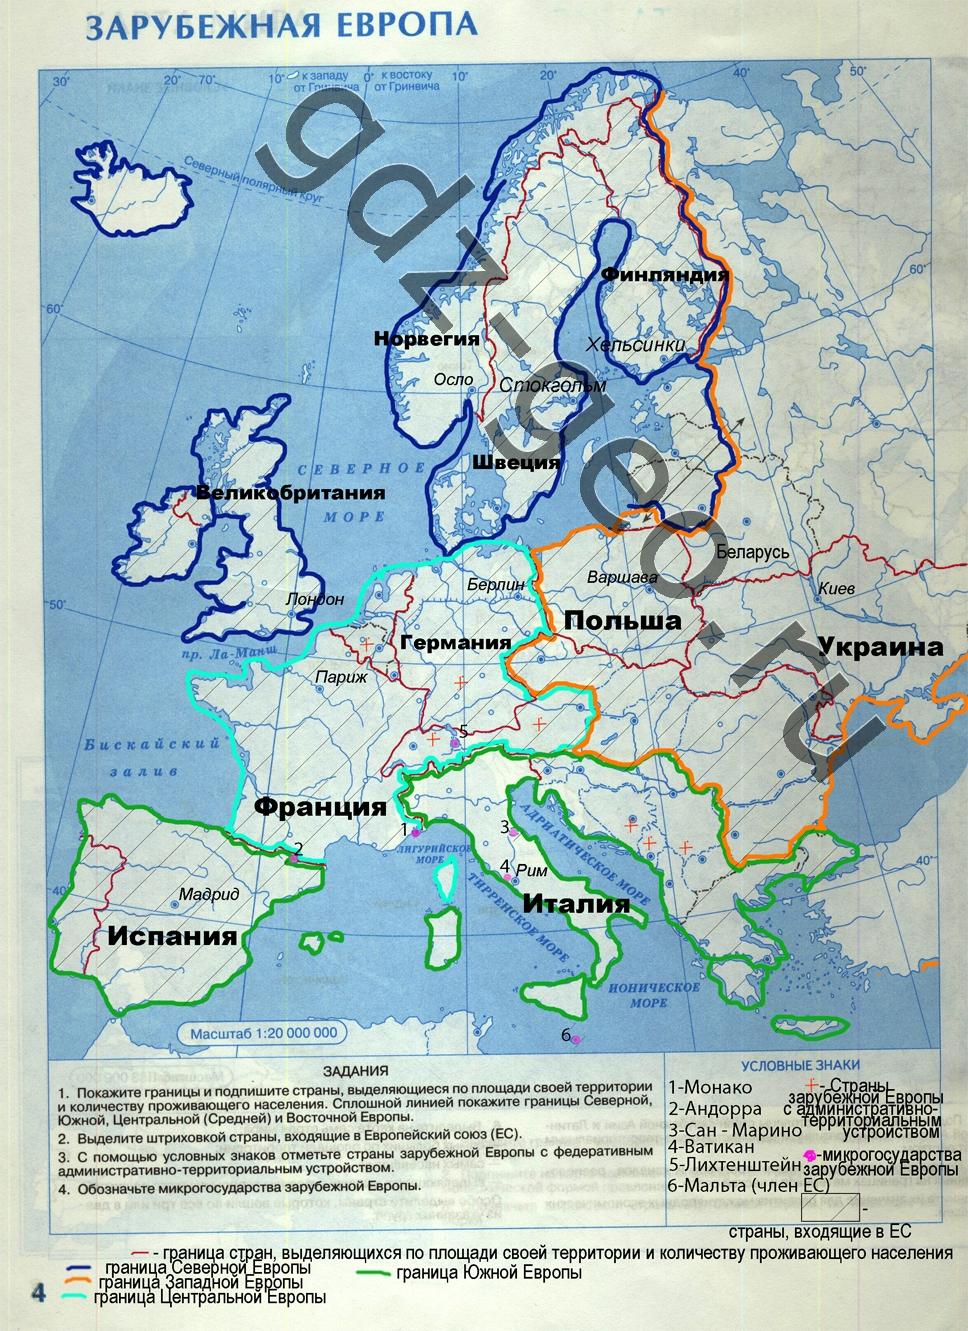 гдз гиография контурную карту